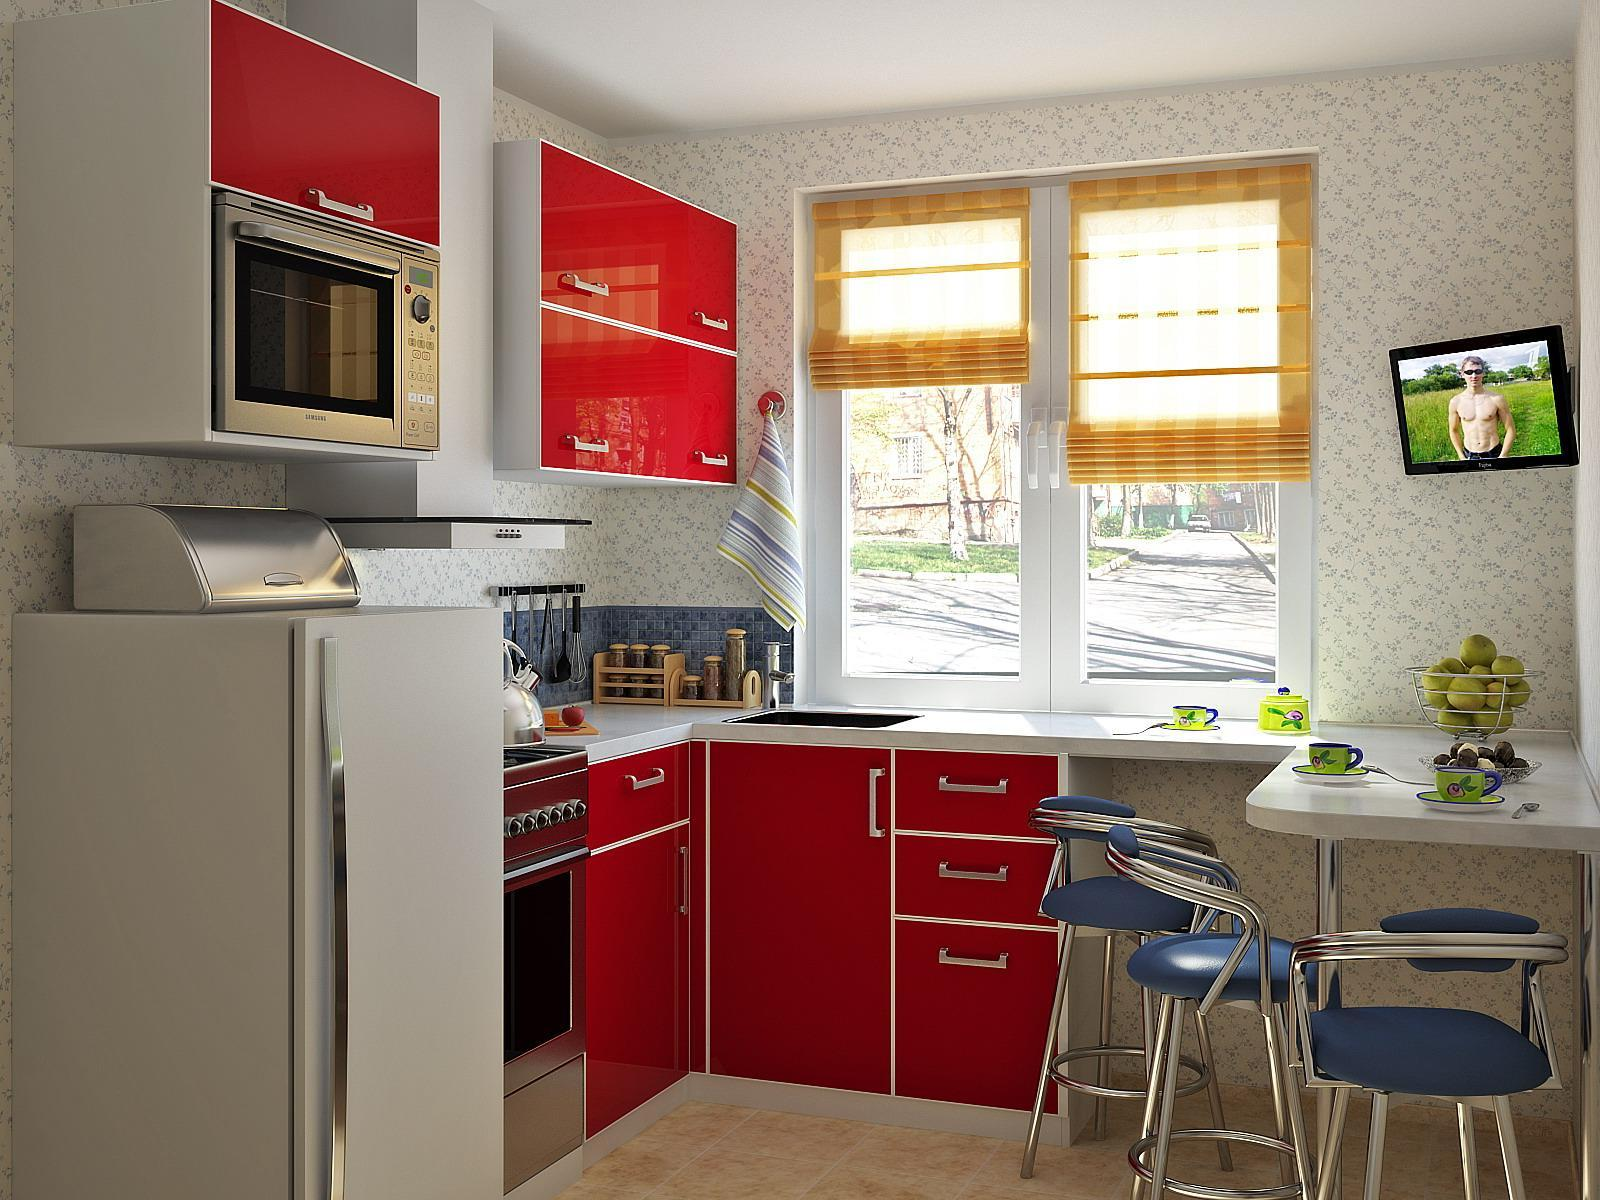 Cocinas modernas peque as estilos y dise os hoy lowcost - Relojes para cocinas modernas ...